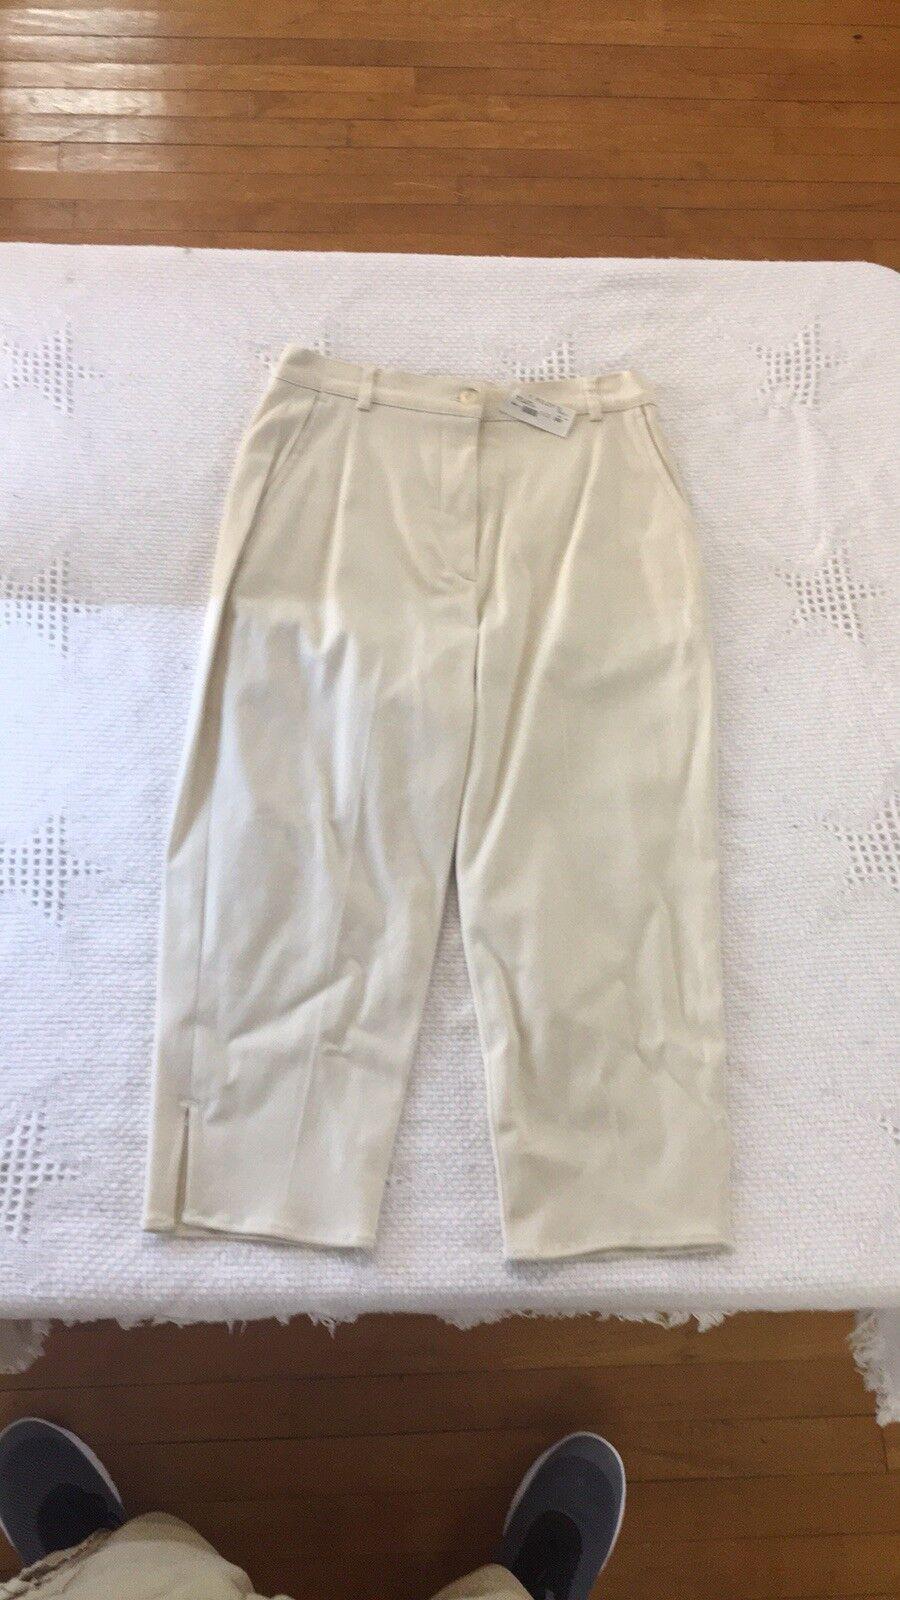 PantsTrousersWOMENJ.R.MORRISSEY  Cropped Pants SIZE 2 NWT  112 E53